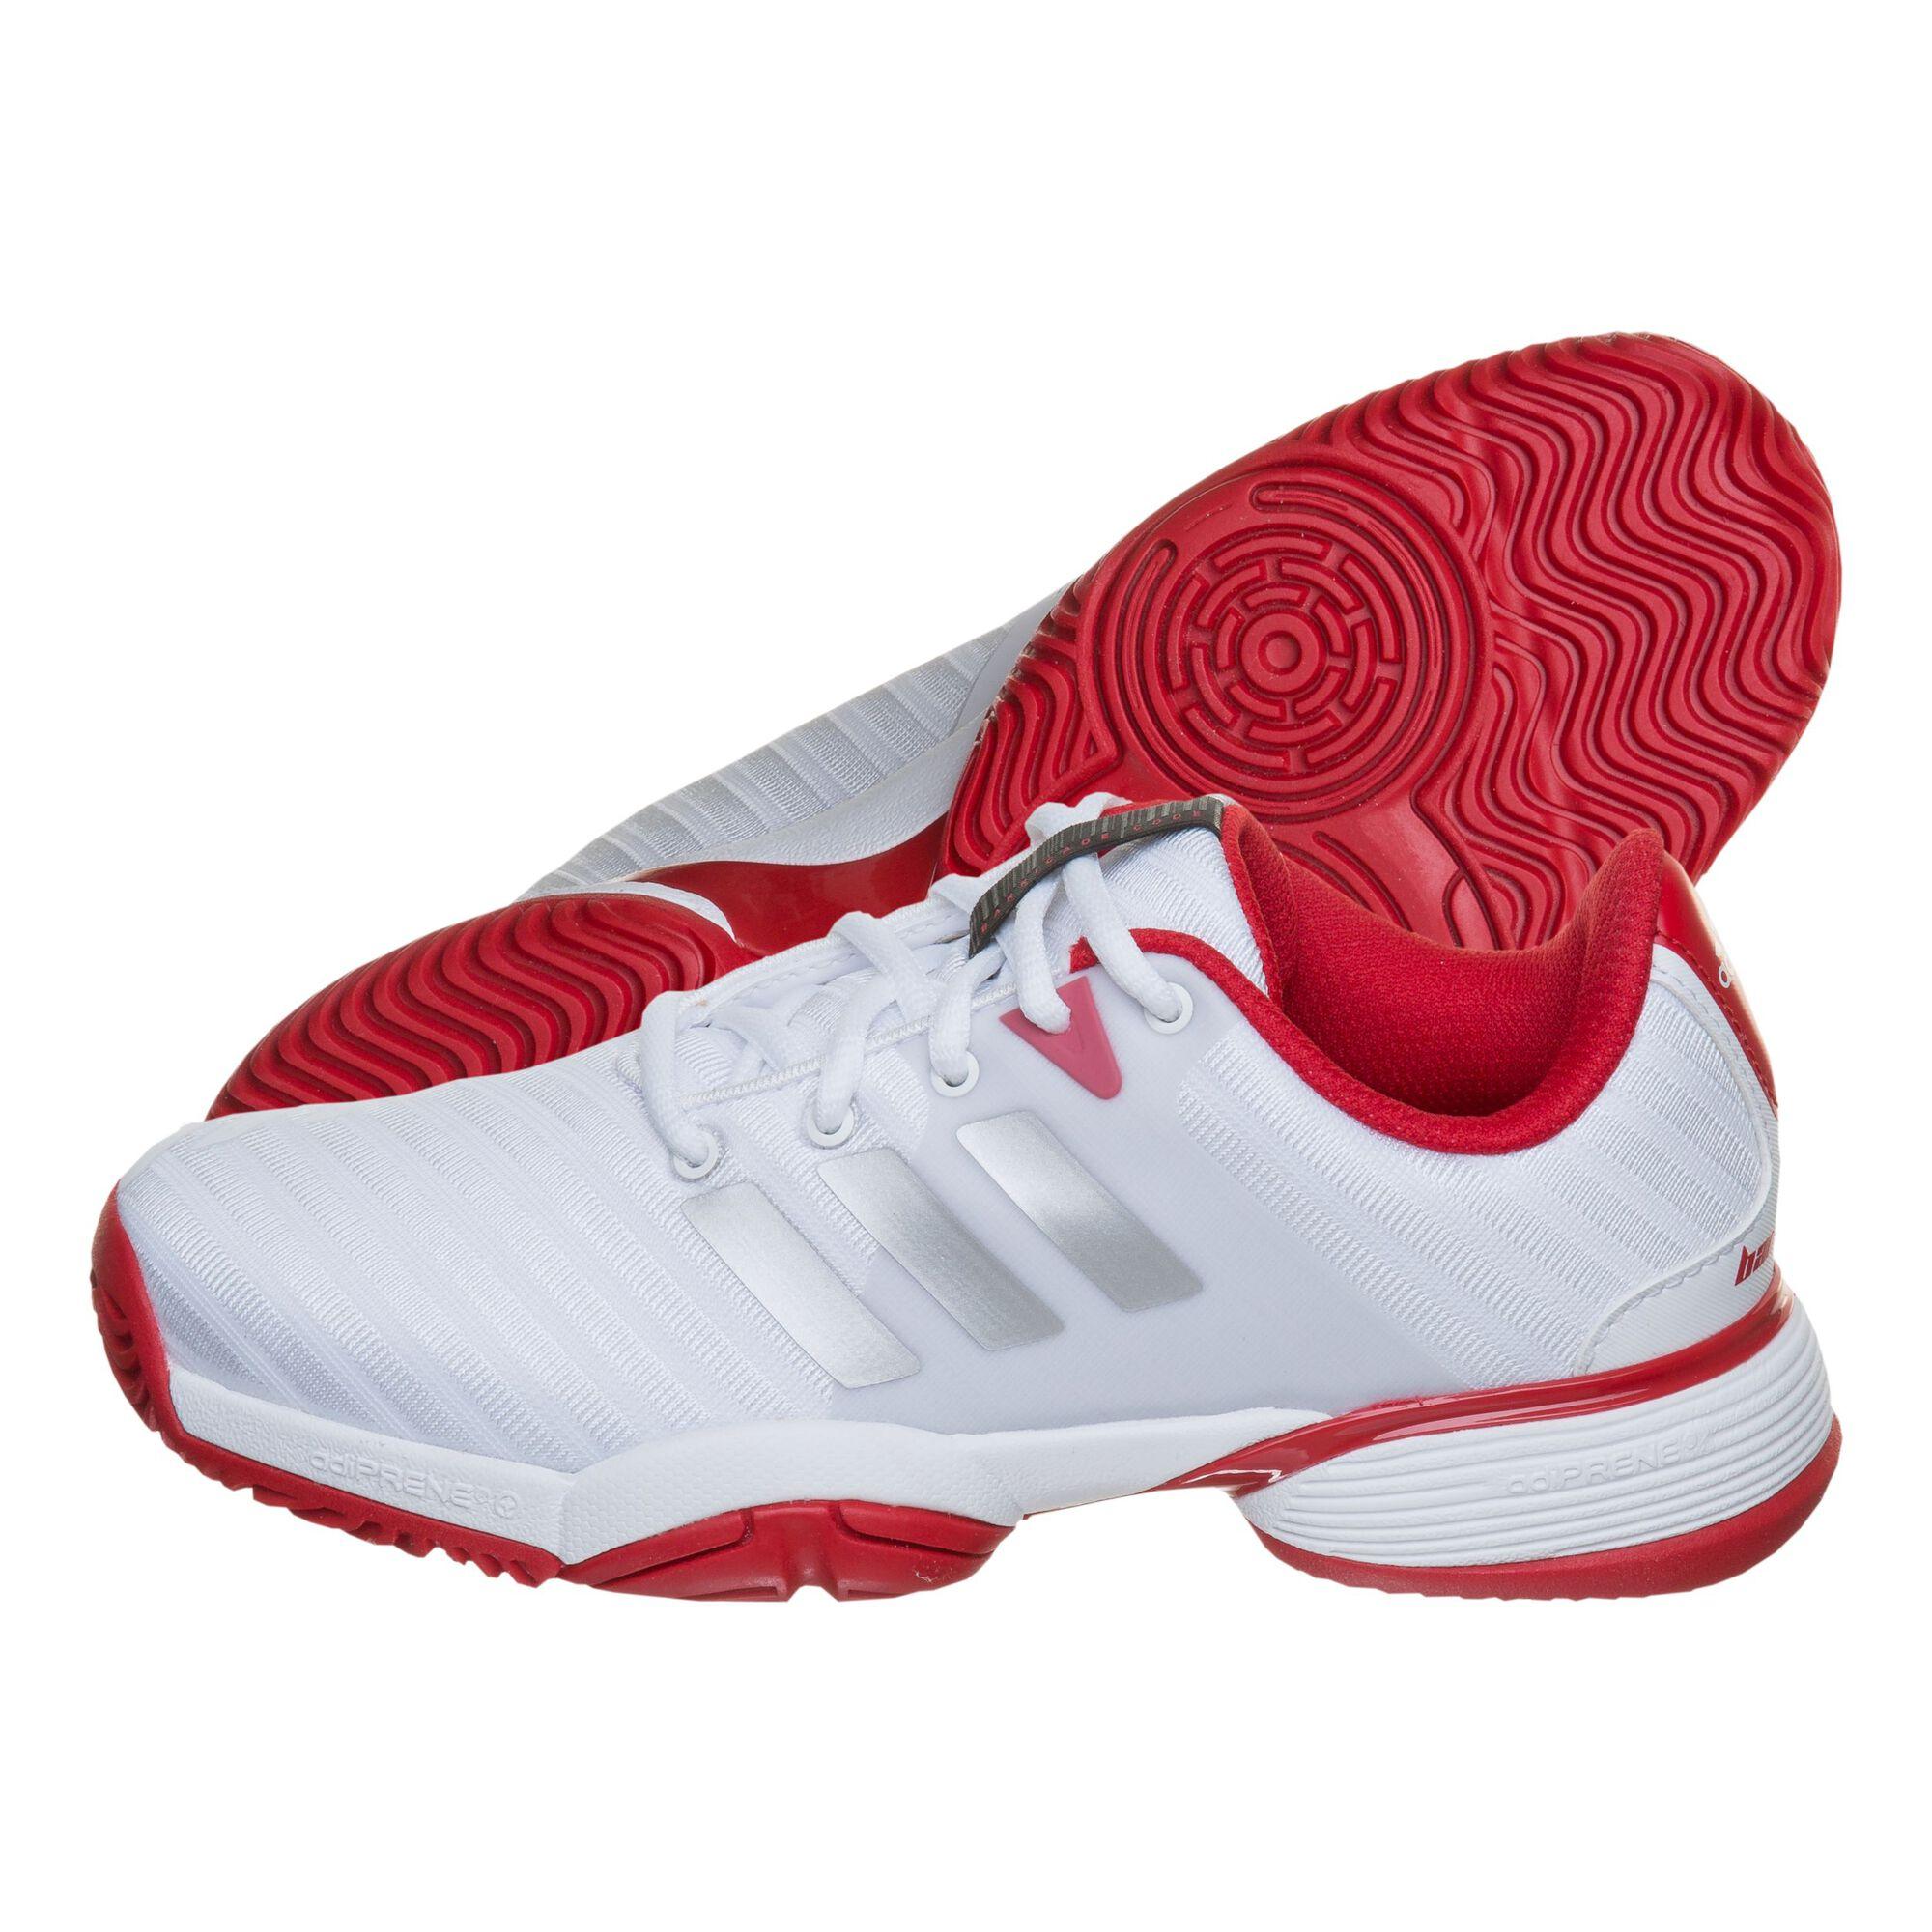 competitive price 8827d 316a6 adidas · adidas · adidas · adidas · adidas ...